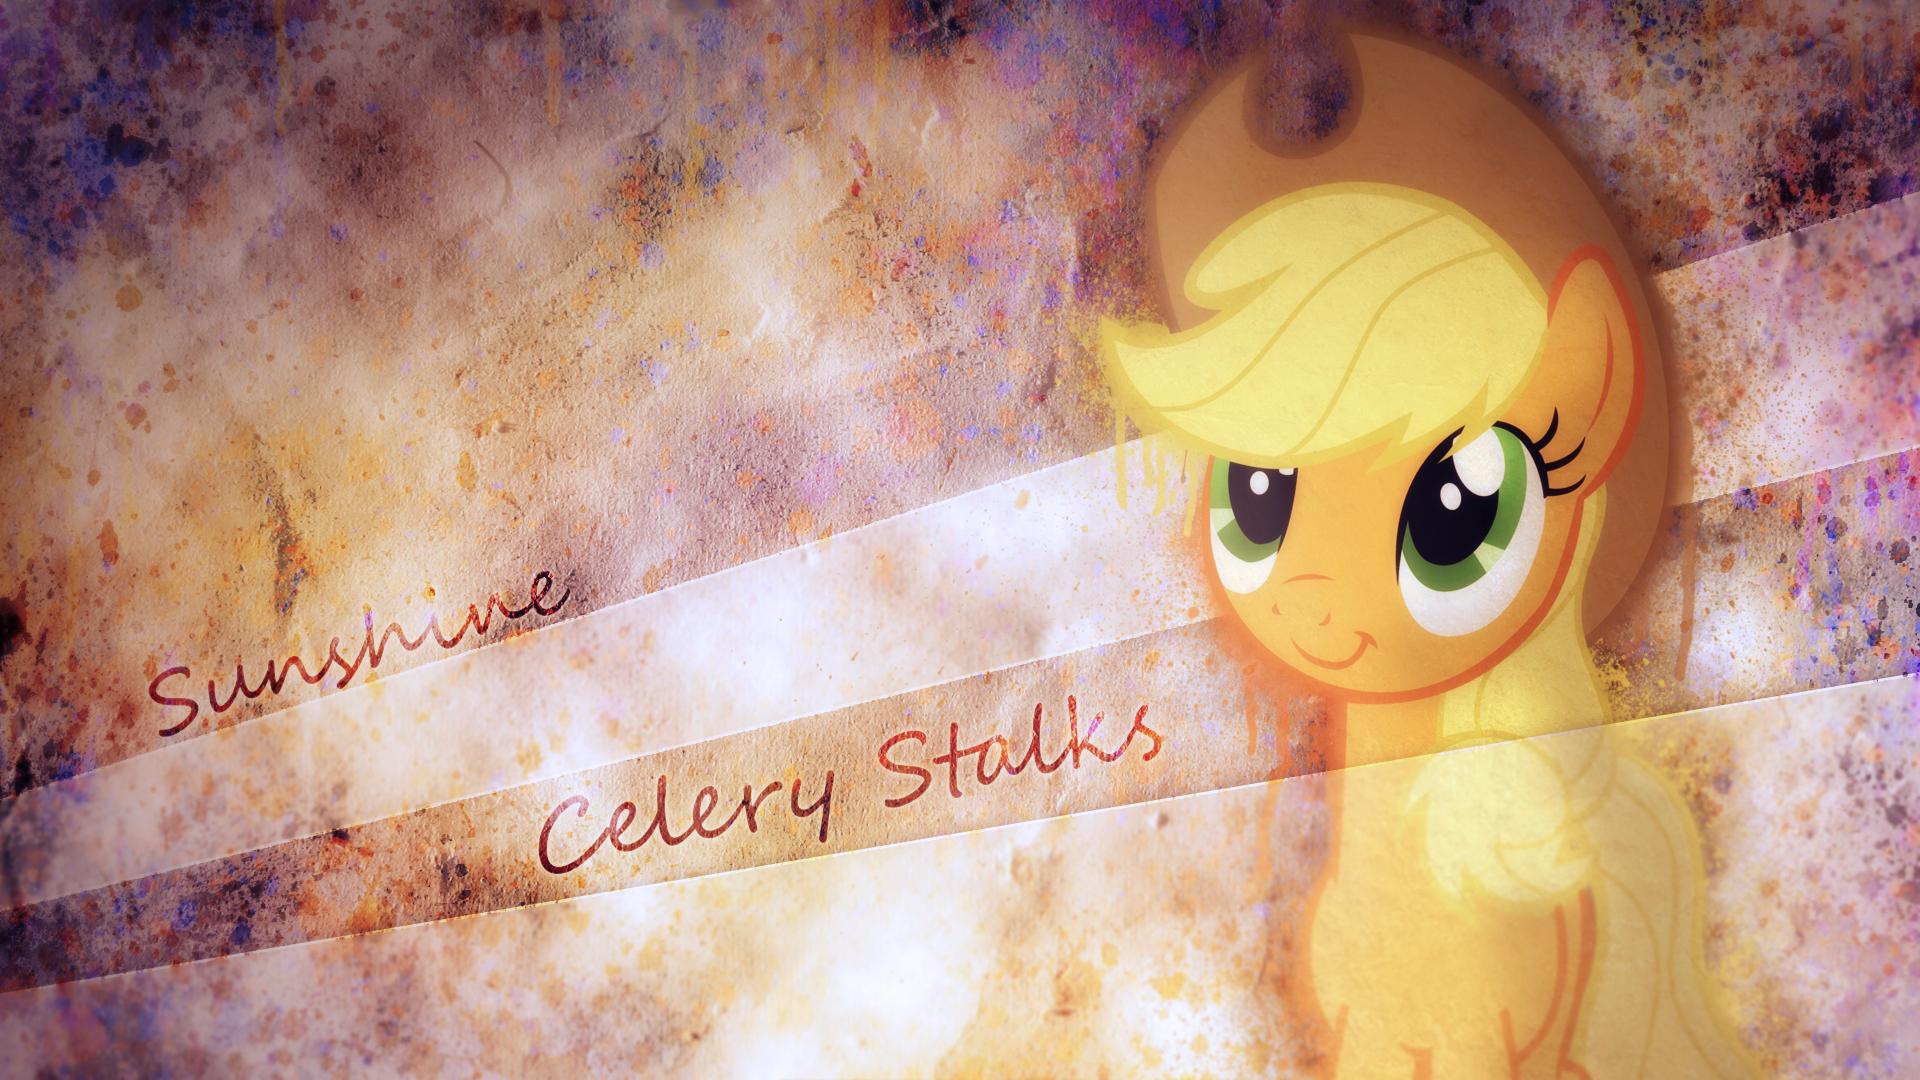 Sunshine and Celery Stalks by SandwichDelta